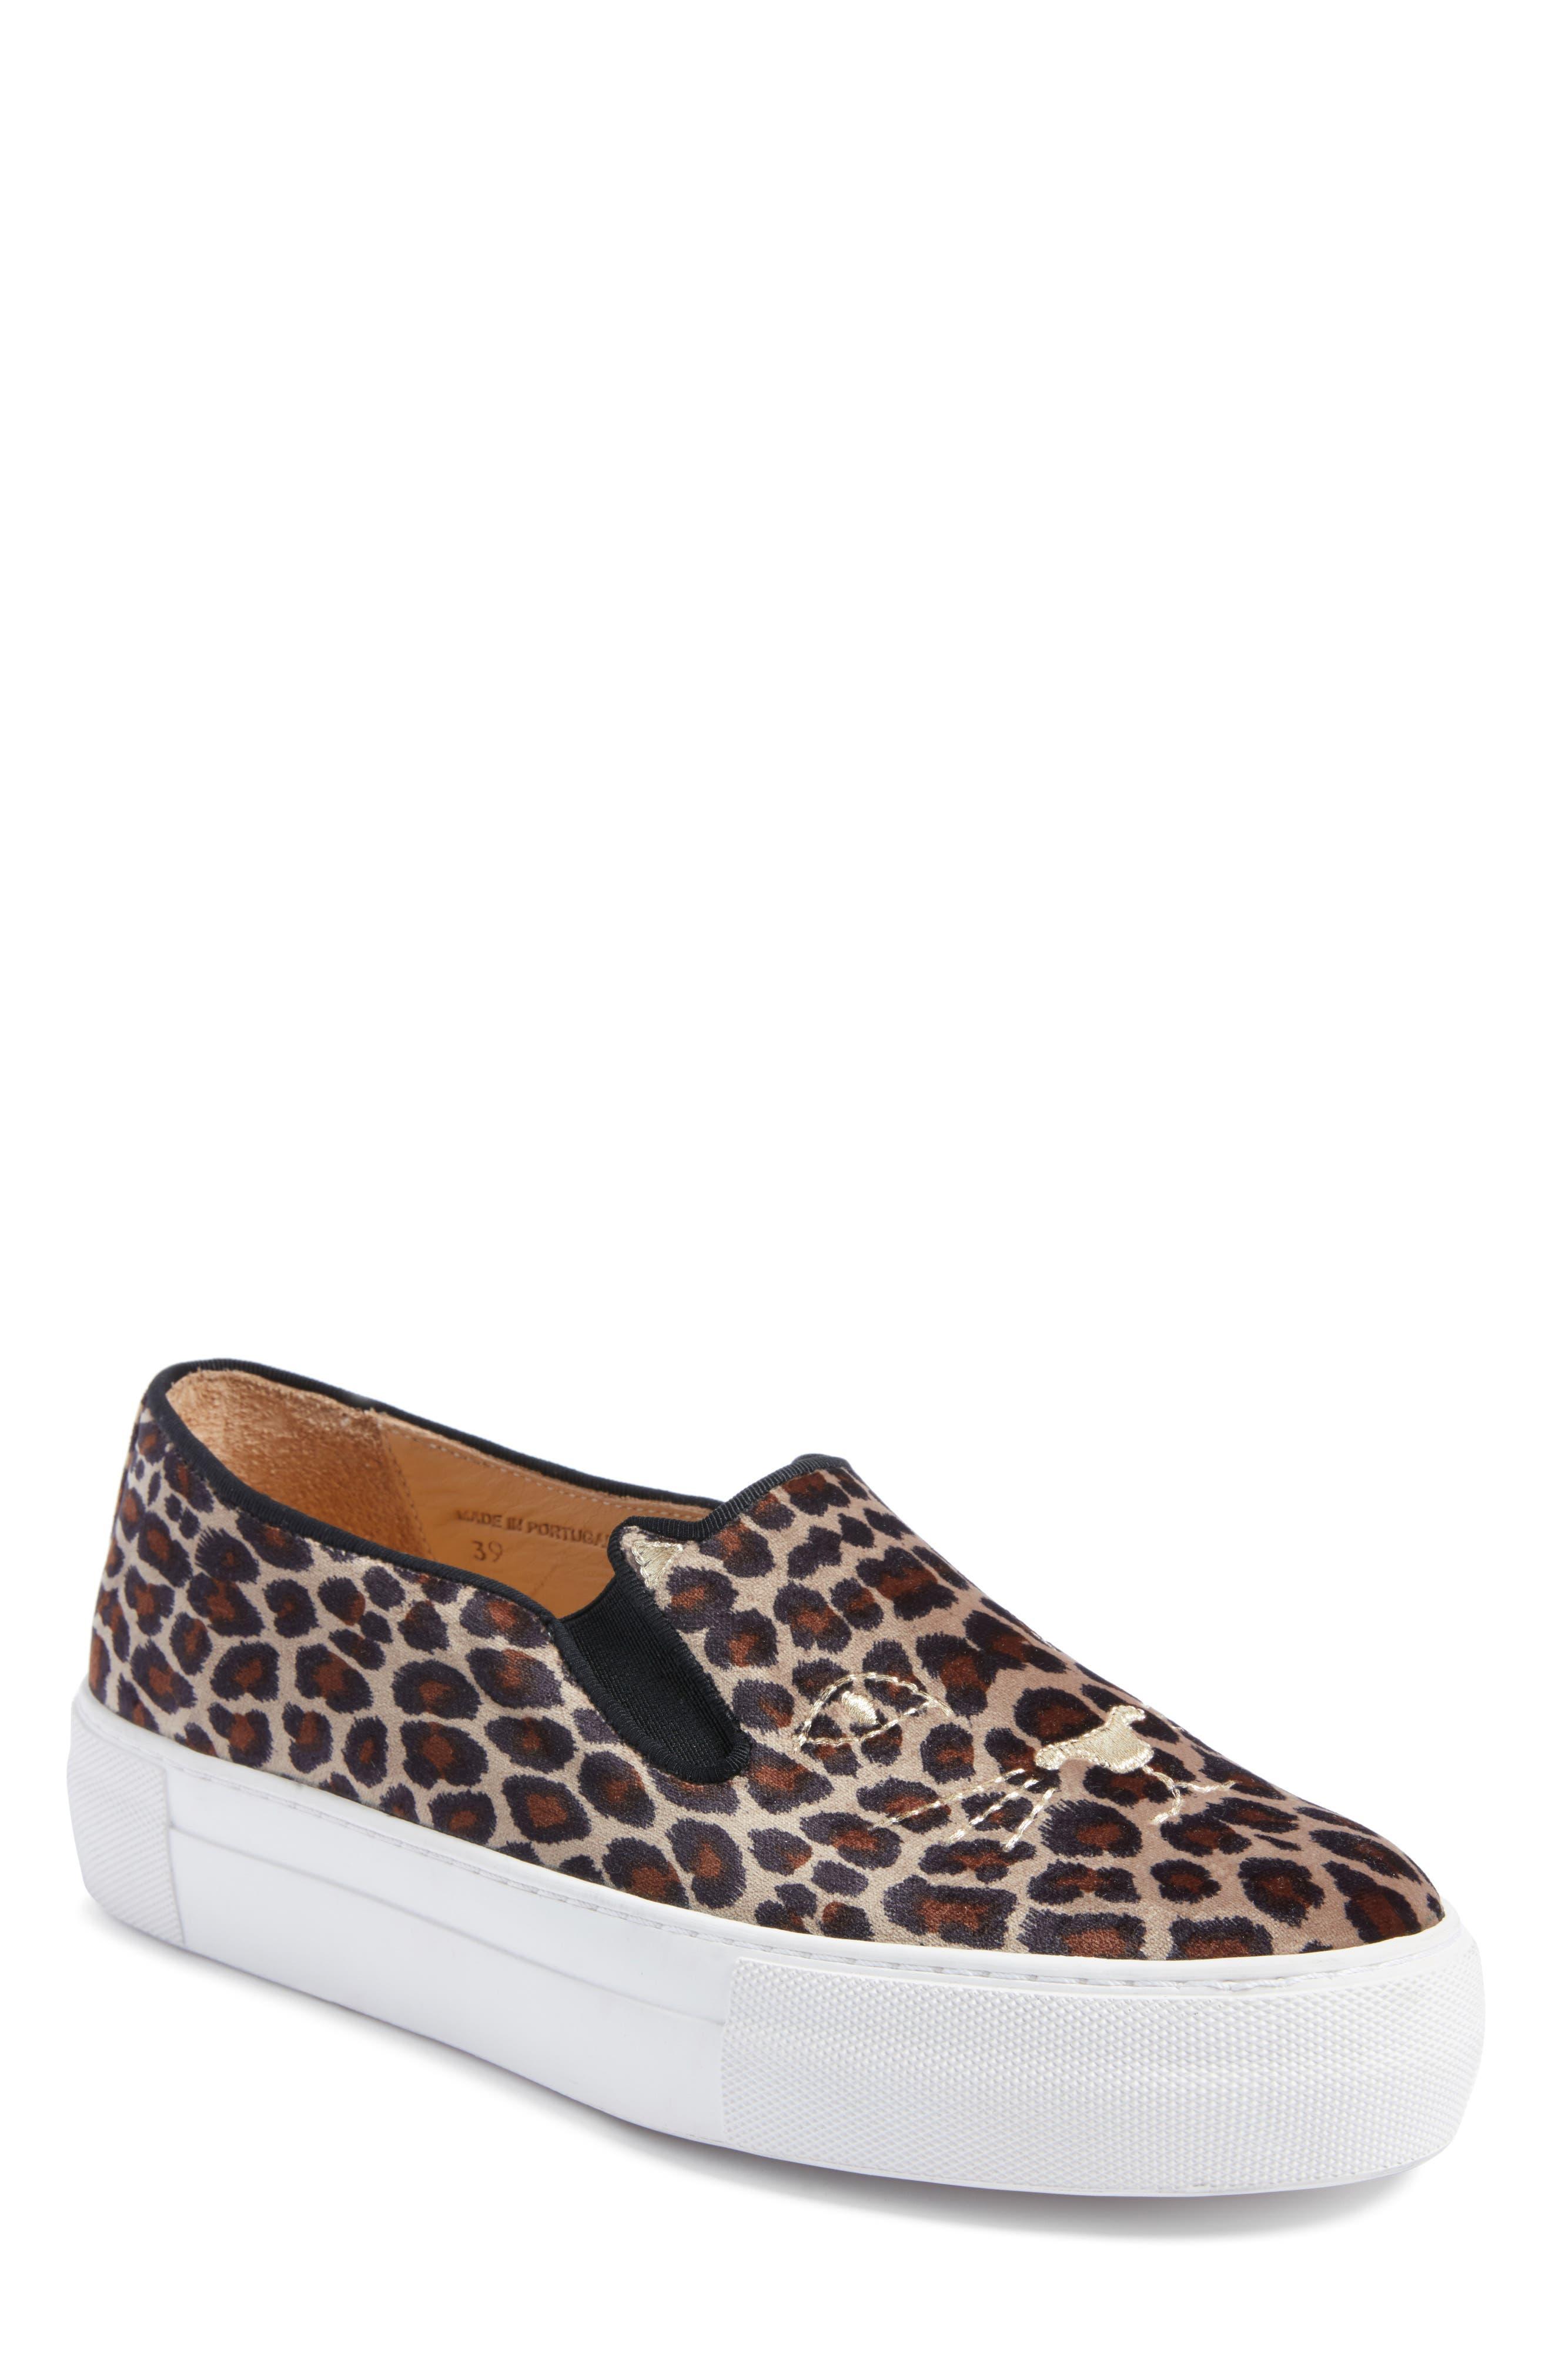 Charlotte Olympia Cool Cats Slip-On Sneaker (Women)